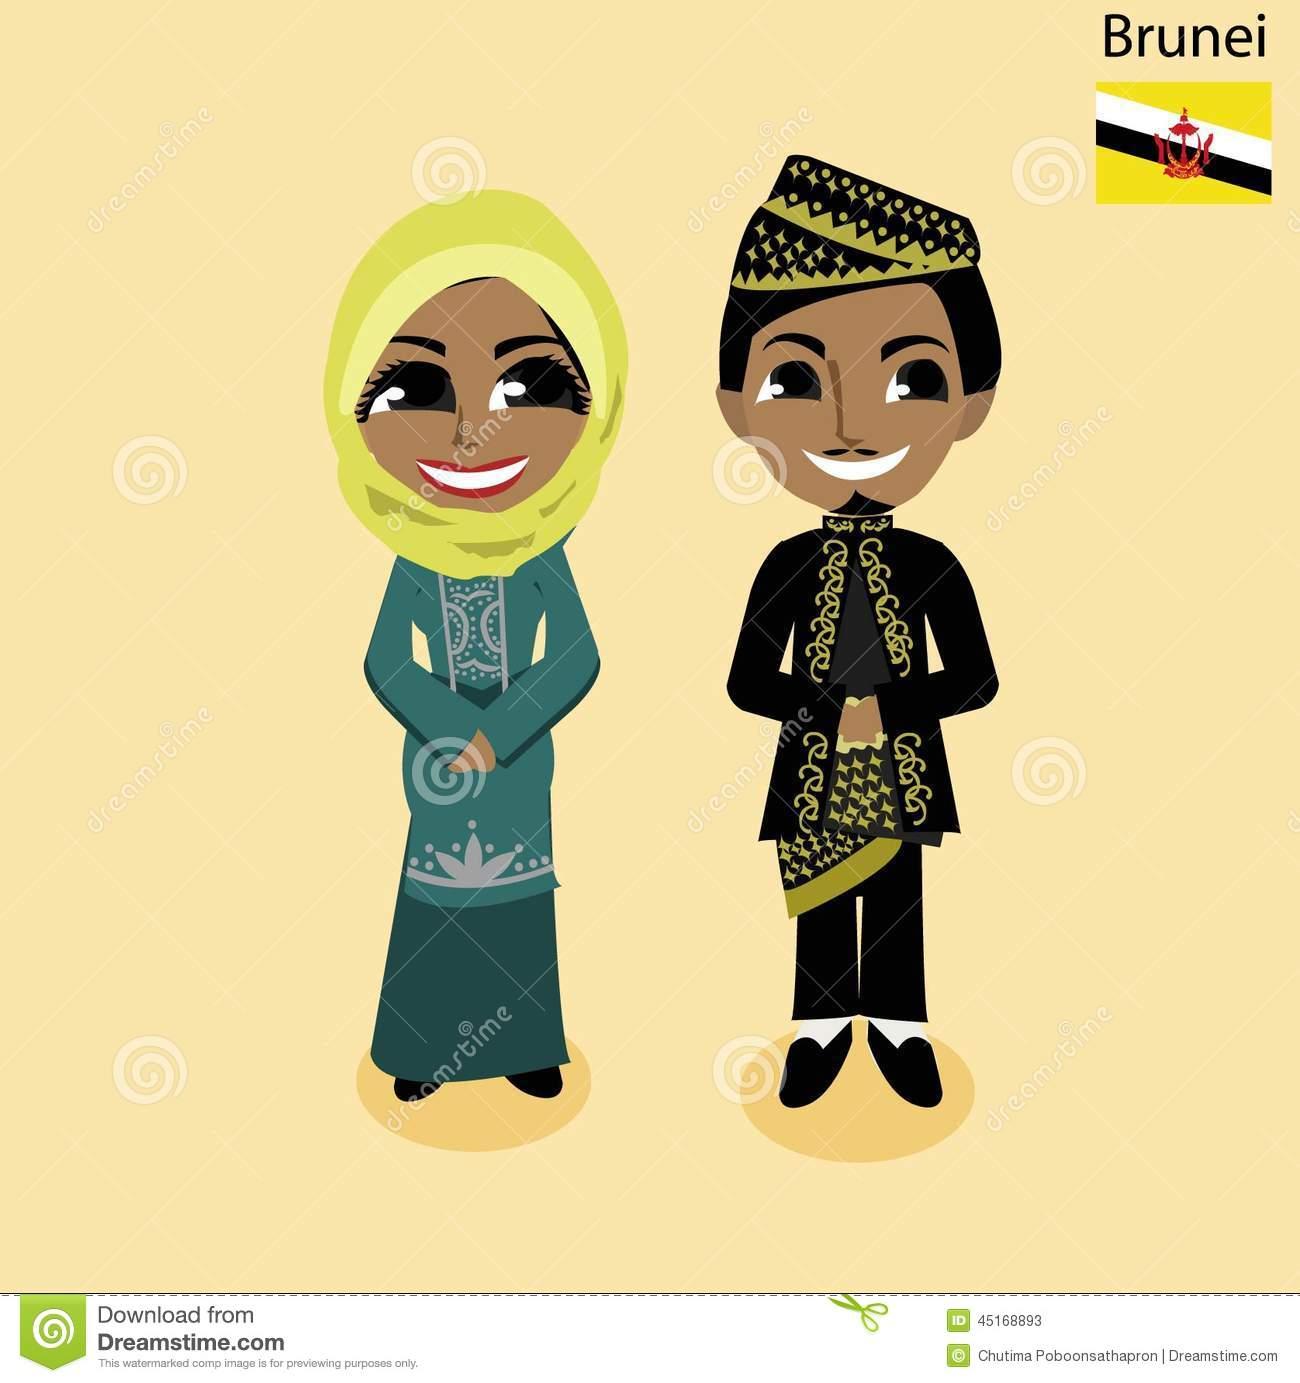 Brunei Stock Illustrations.